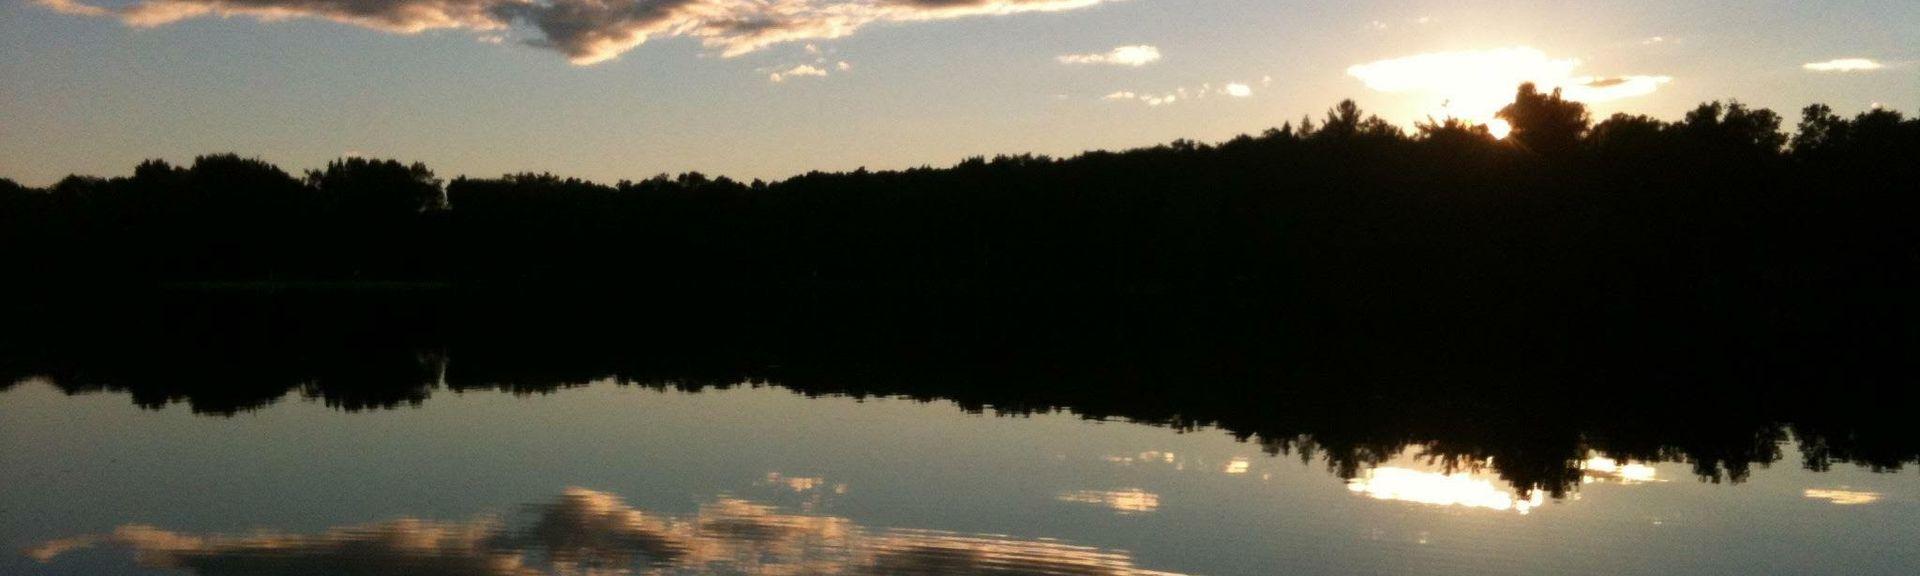 Crescent Lake, Southington, Connecticut, Verenigde Staten